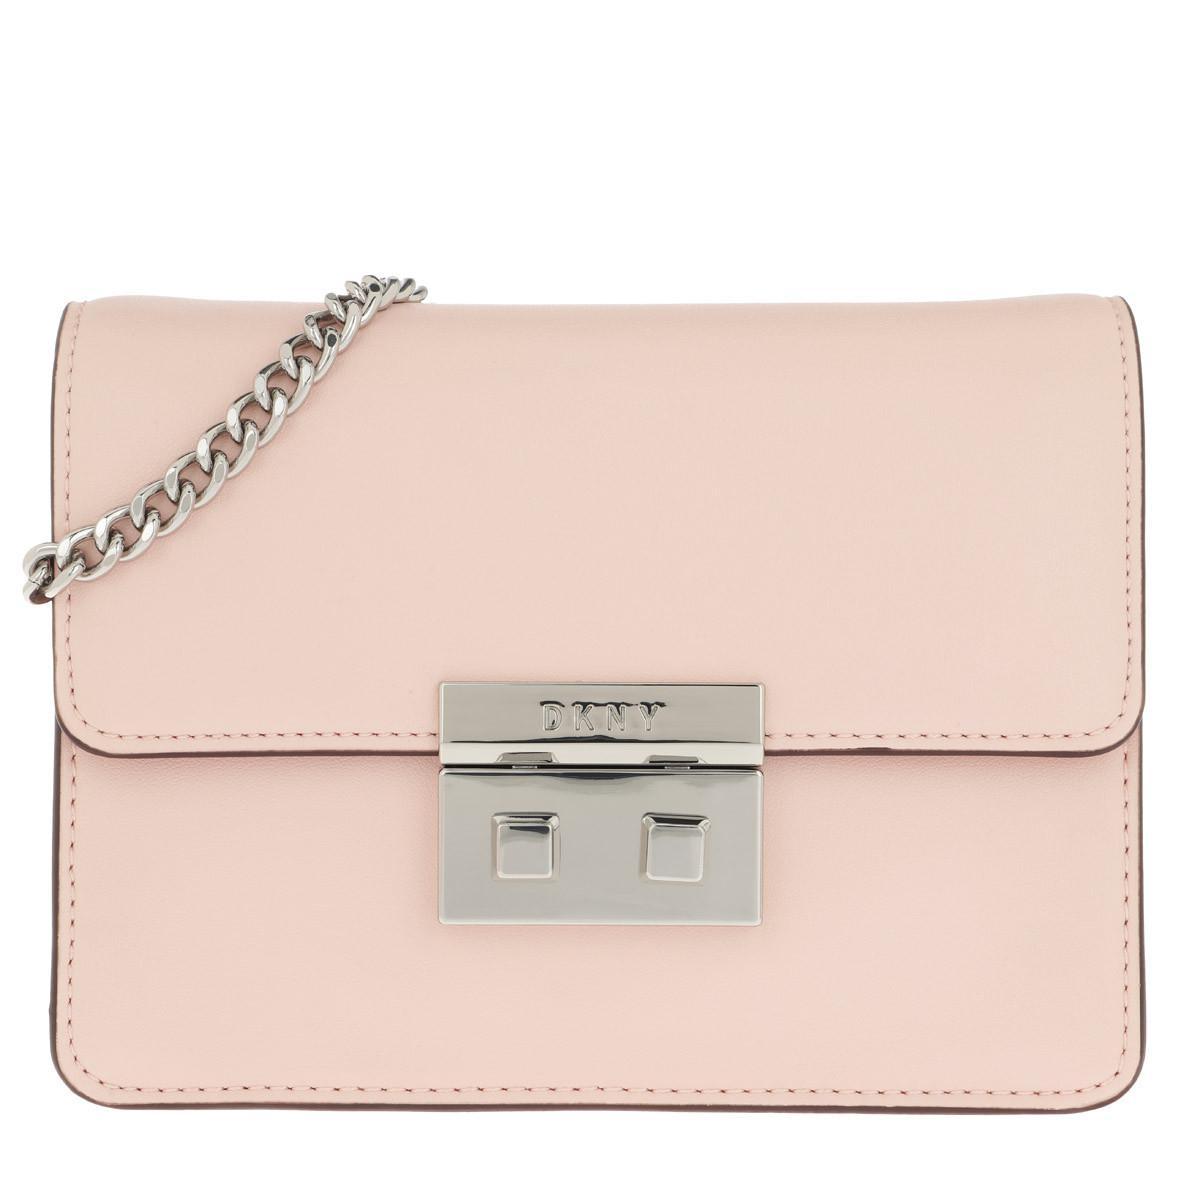 Cross Body Bags - Ann SM Shoulder Bag Quartz - rose - Cross Body Bags for ladies DKNY Krc12UD6